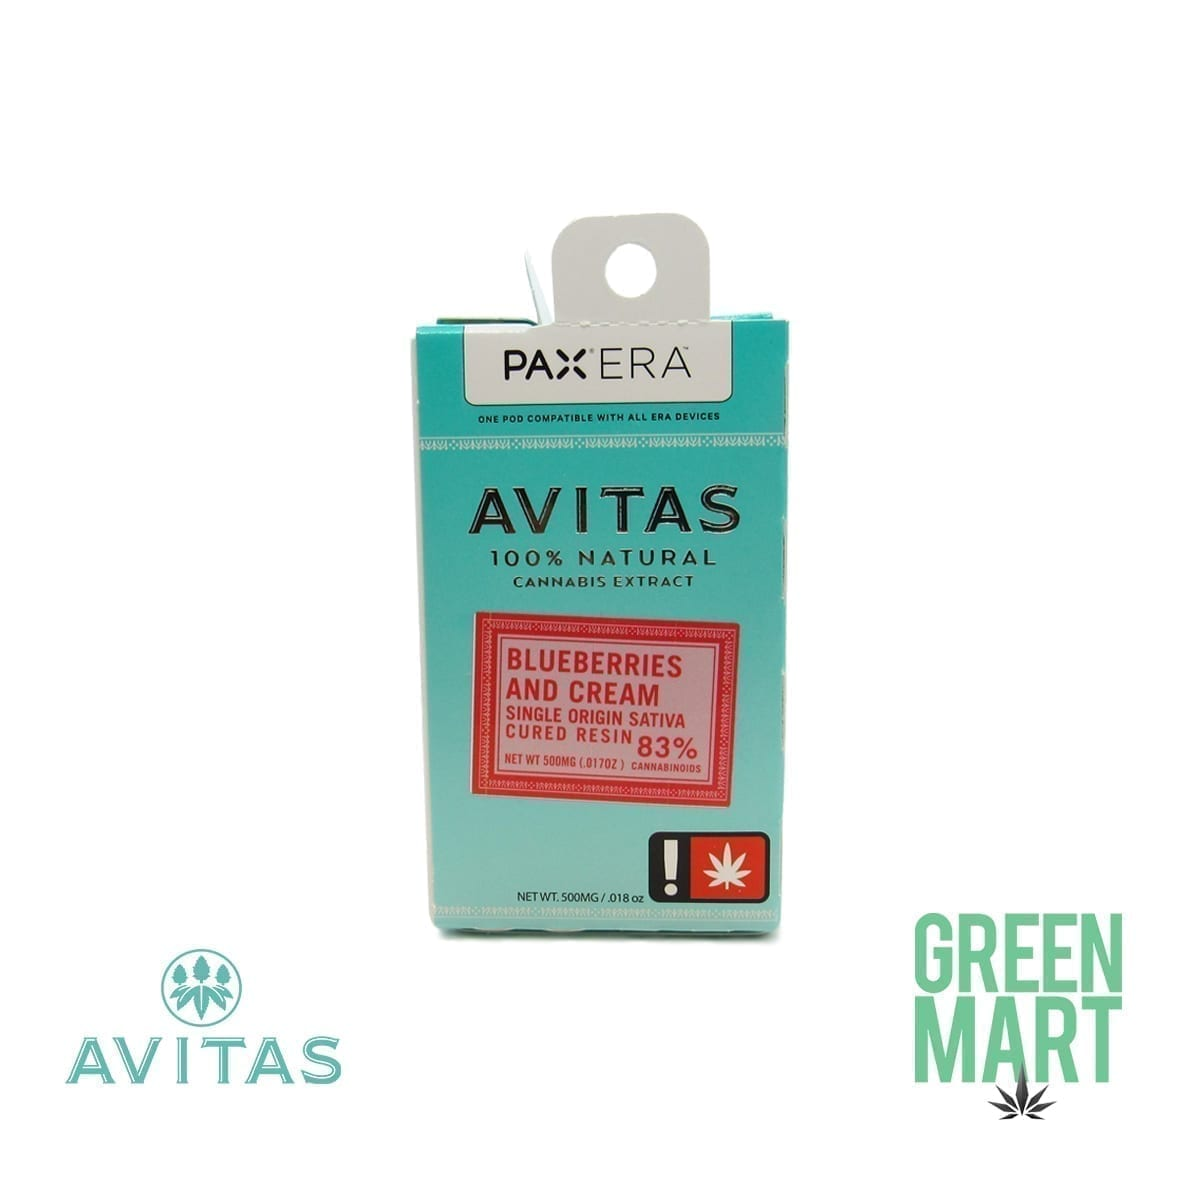 Avitas Pax Era Pod - Blueberries & Cream